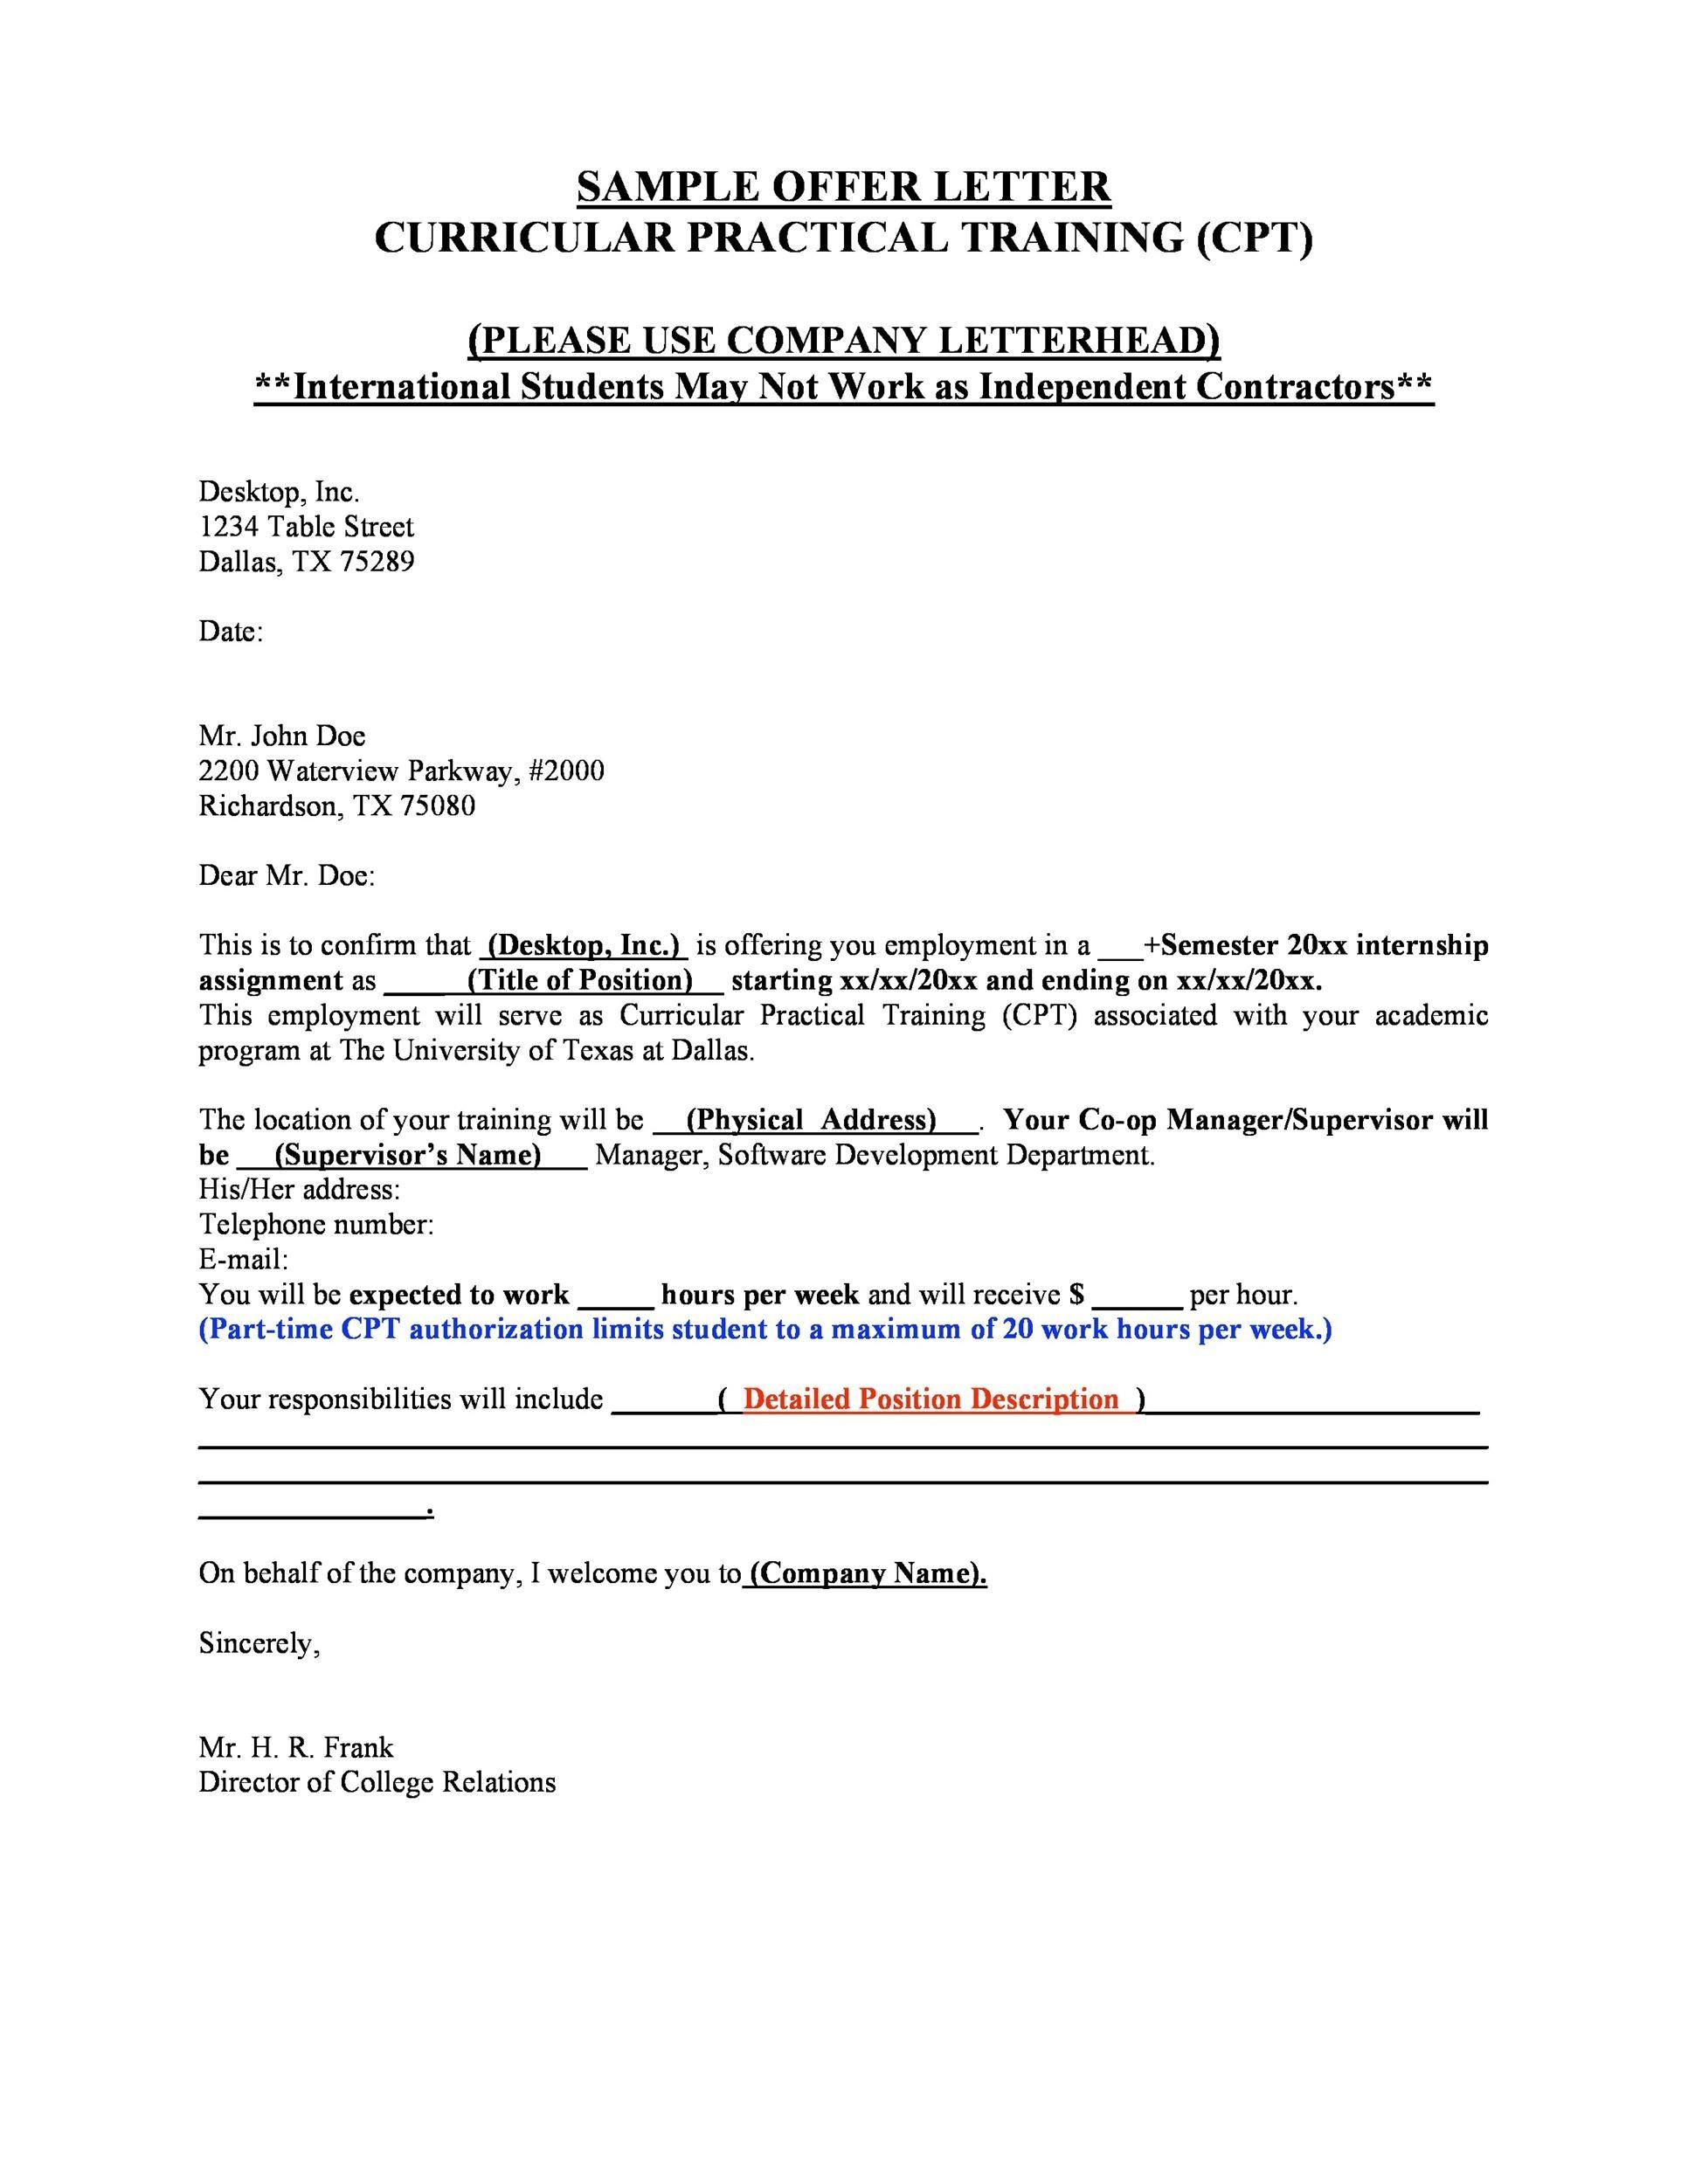 Free Offer letter 14